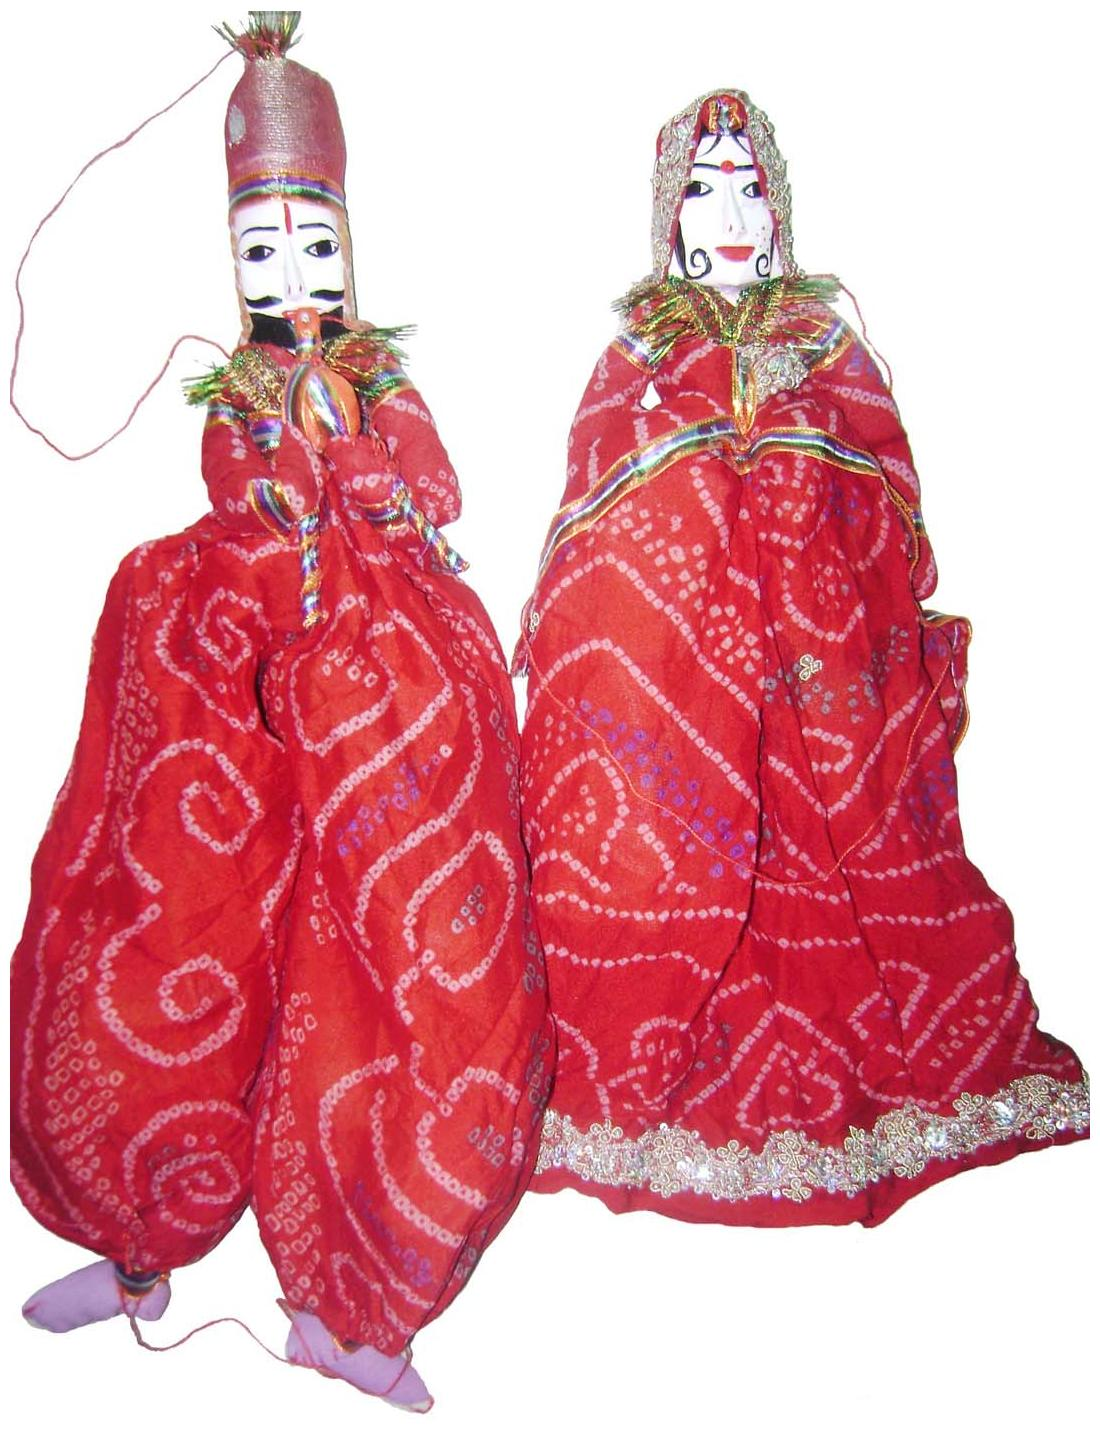 Craft 64 Rajasthani Traditional Handmade Puppets Pair